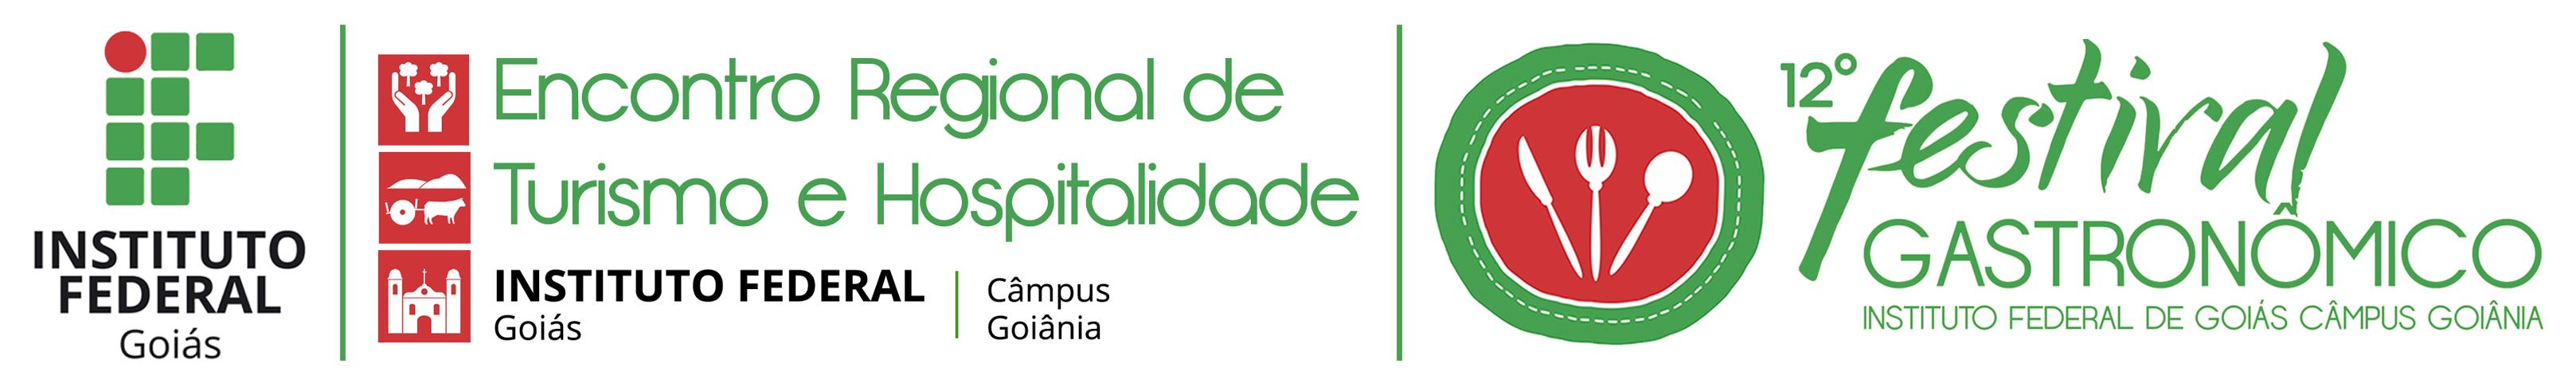 12° Festival Gastronômico - Campus Goiânia